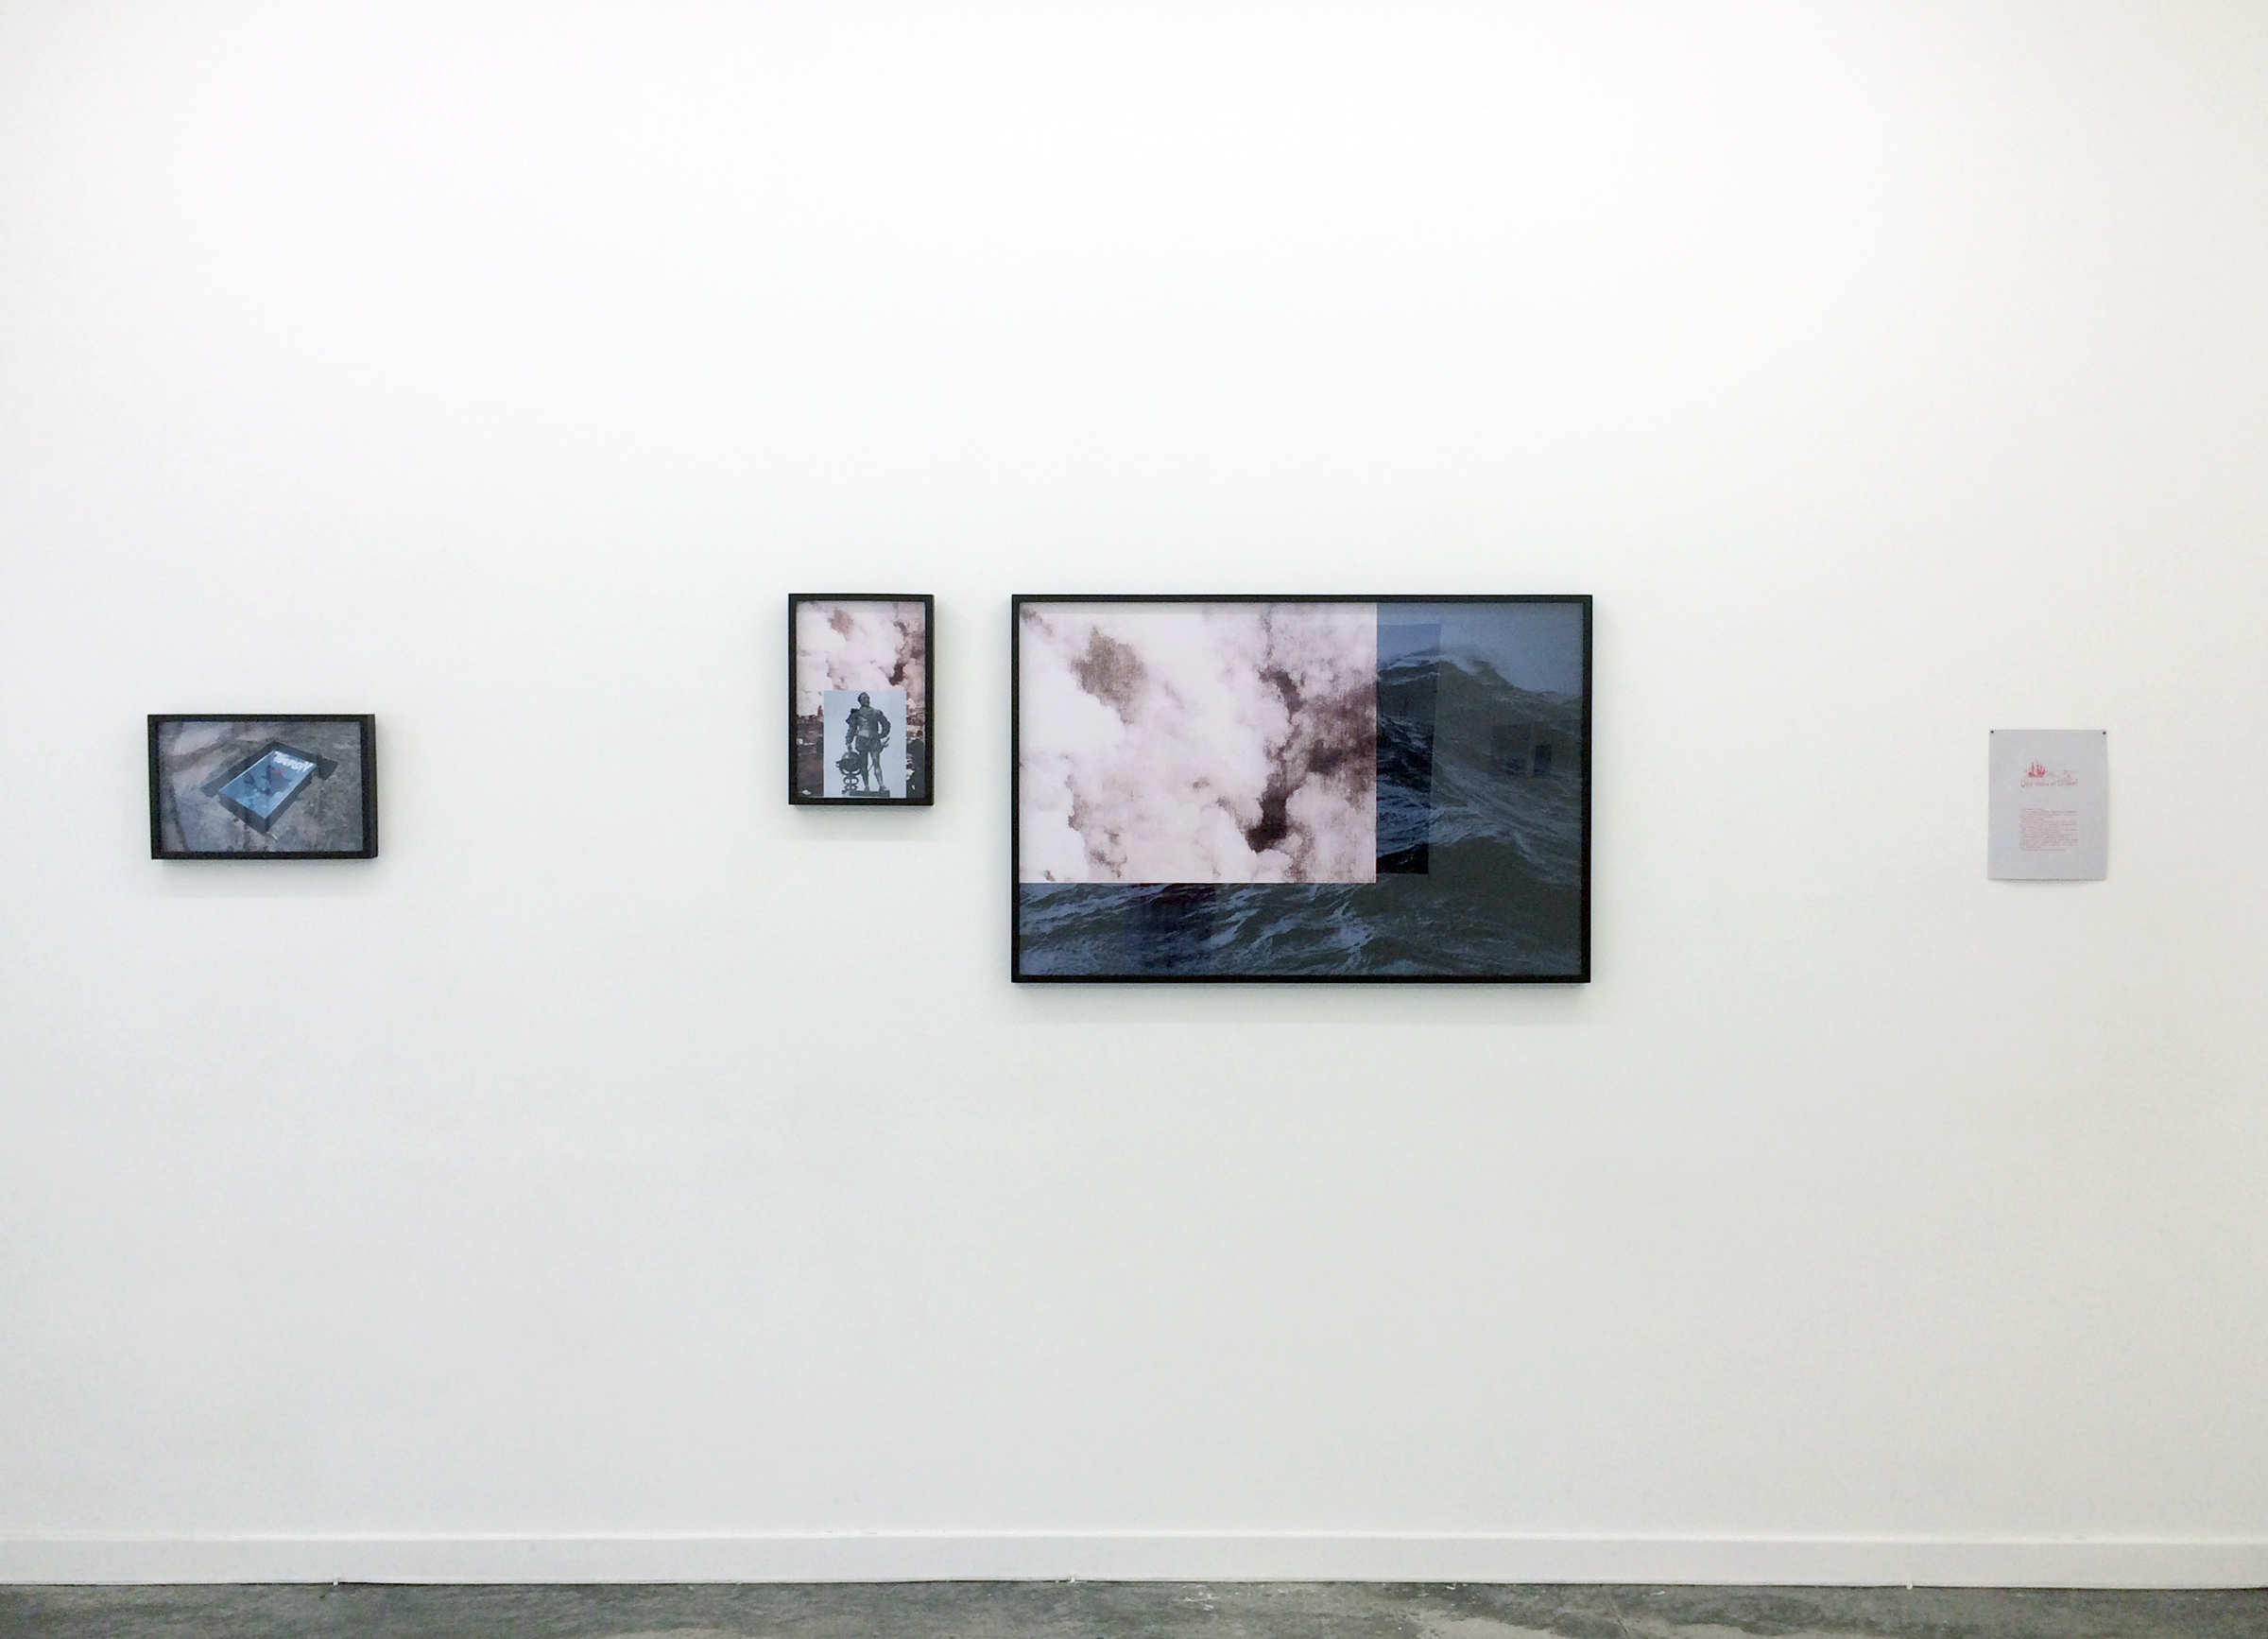 PABLO GUARDIOLA,  MAINTENANCE YARD  Installation